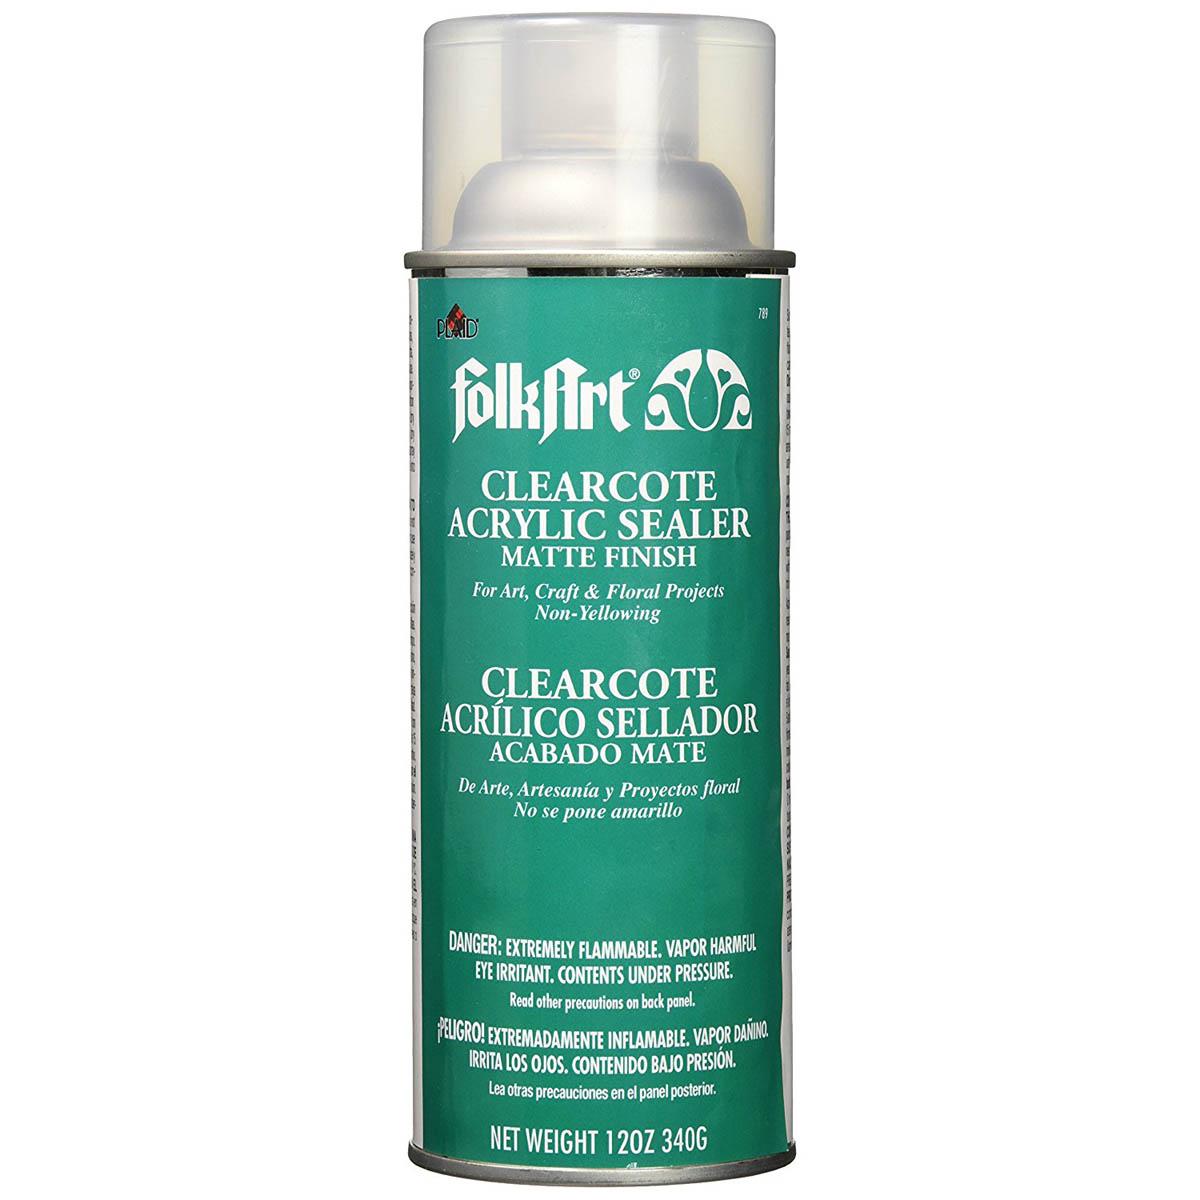 FolkArt ® Finishes - Clearcote™ Aerosol Acrylic Sealer - Matte, 12 oz. - 789